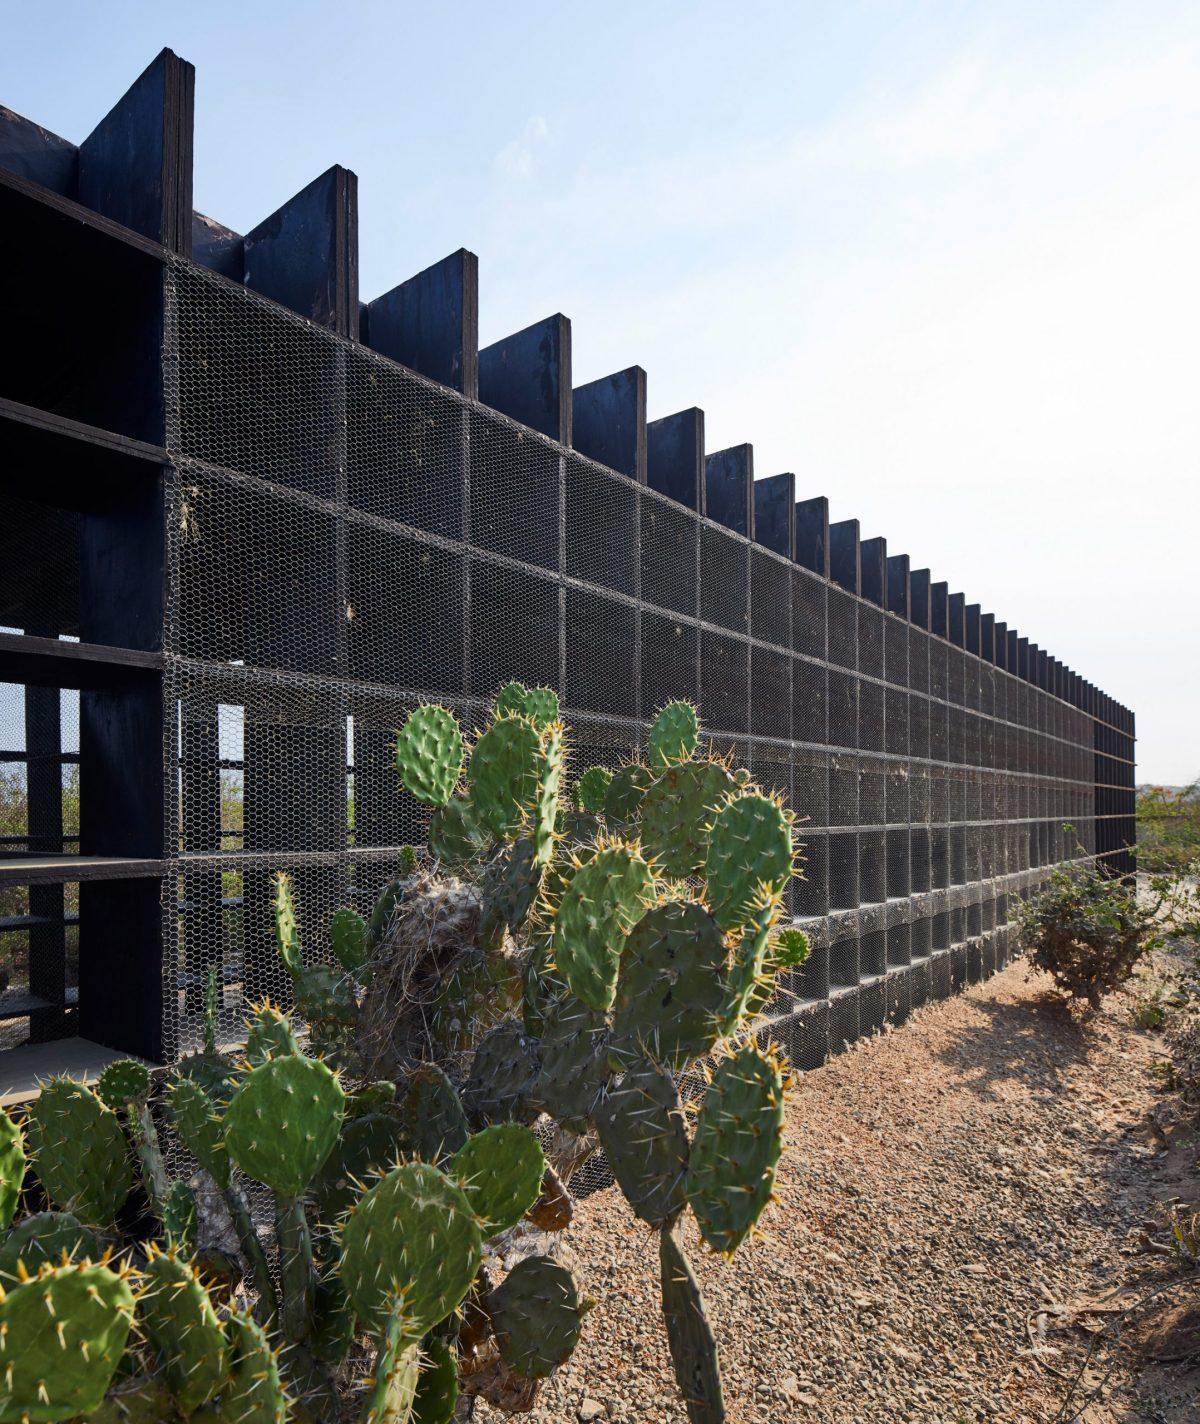 casa-wabi-coop-kengo-kuma-architecture-mexico-12